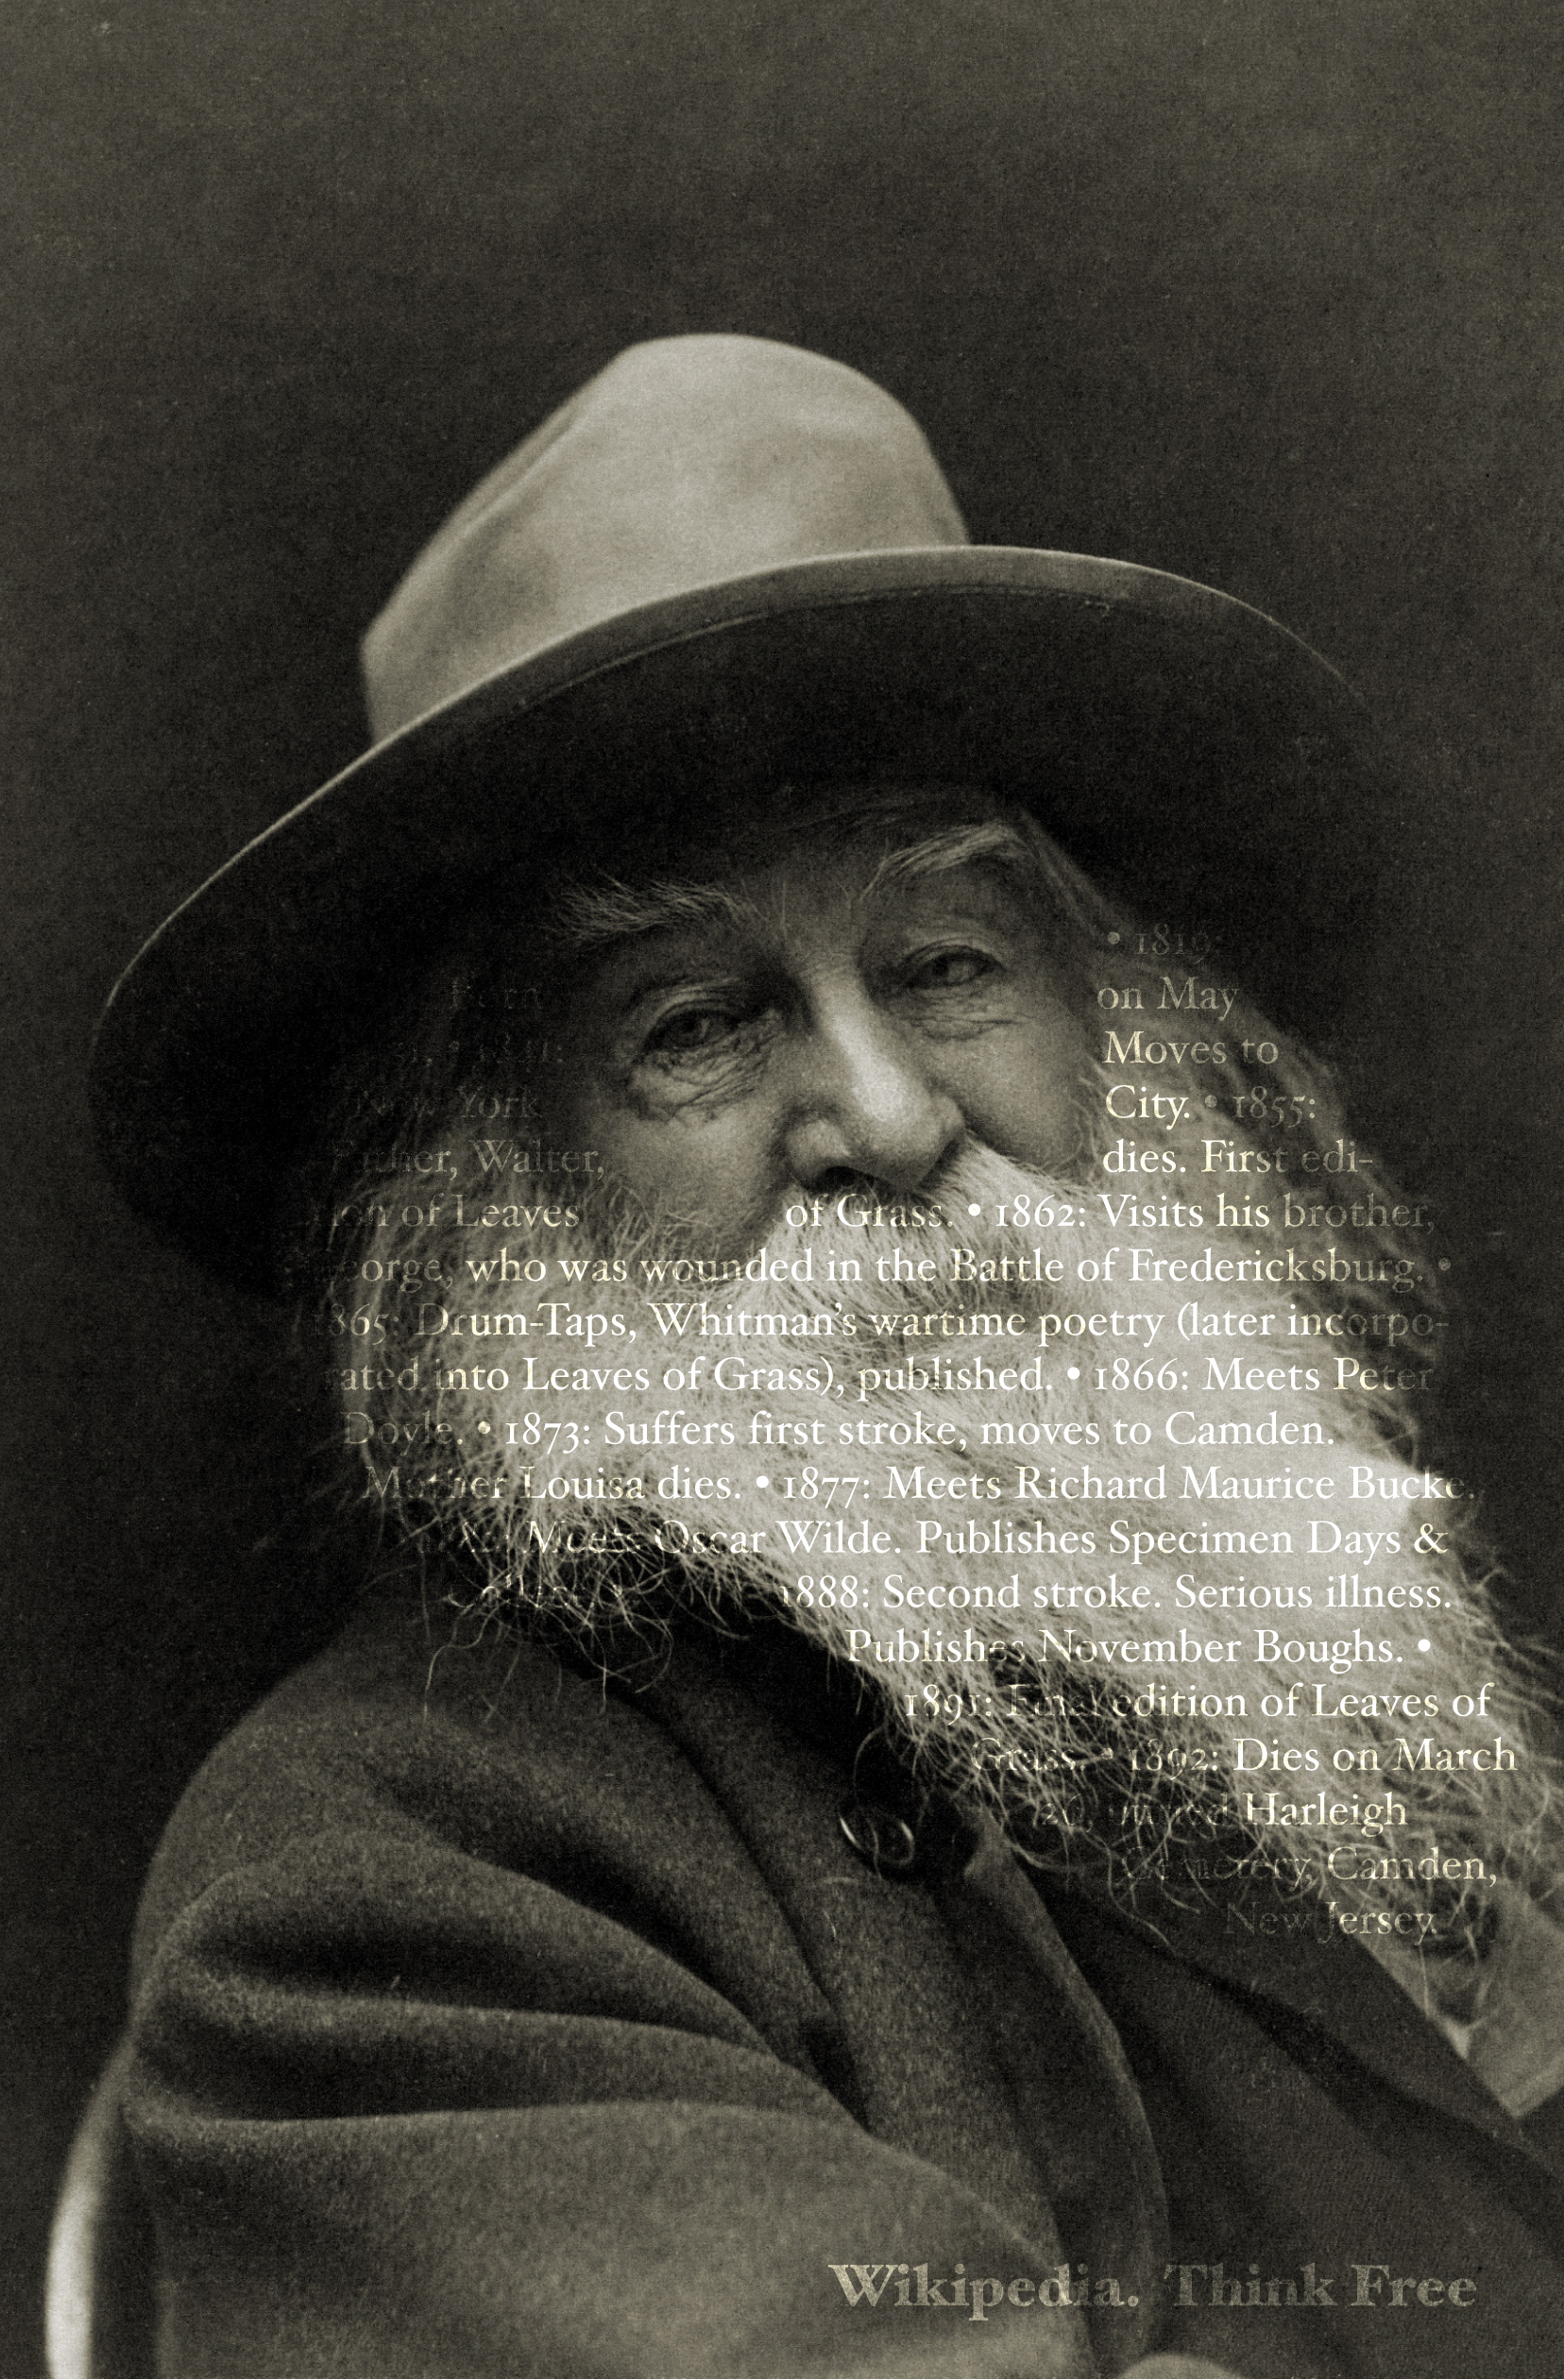 File:Walt Whitman poster.jpg - Wikimedia Commons